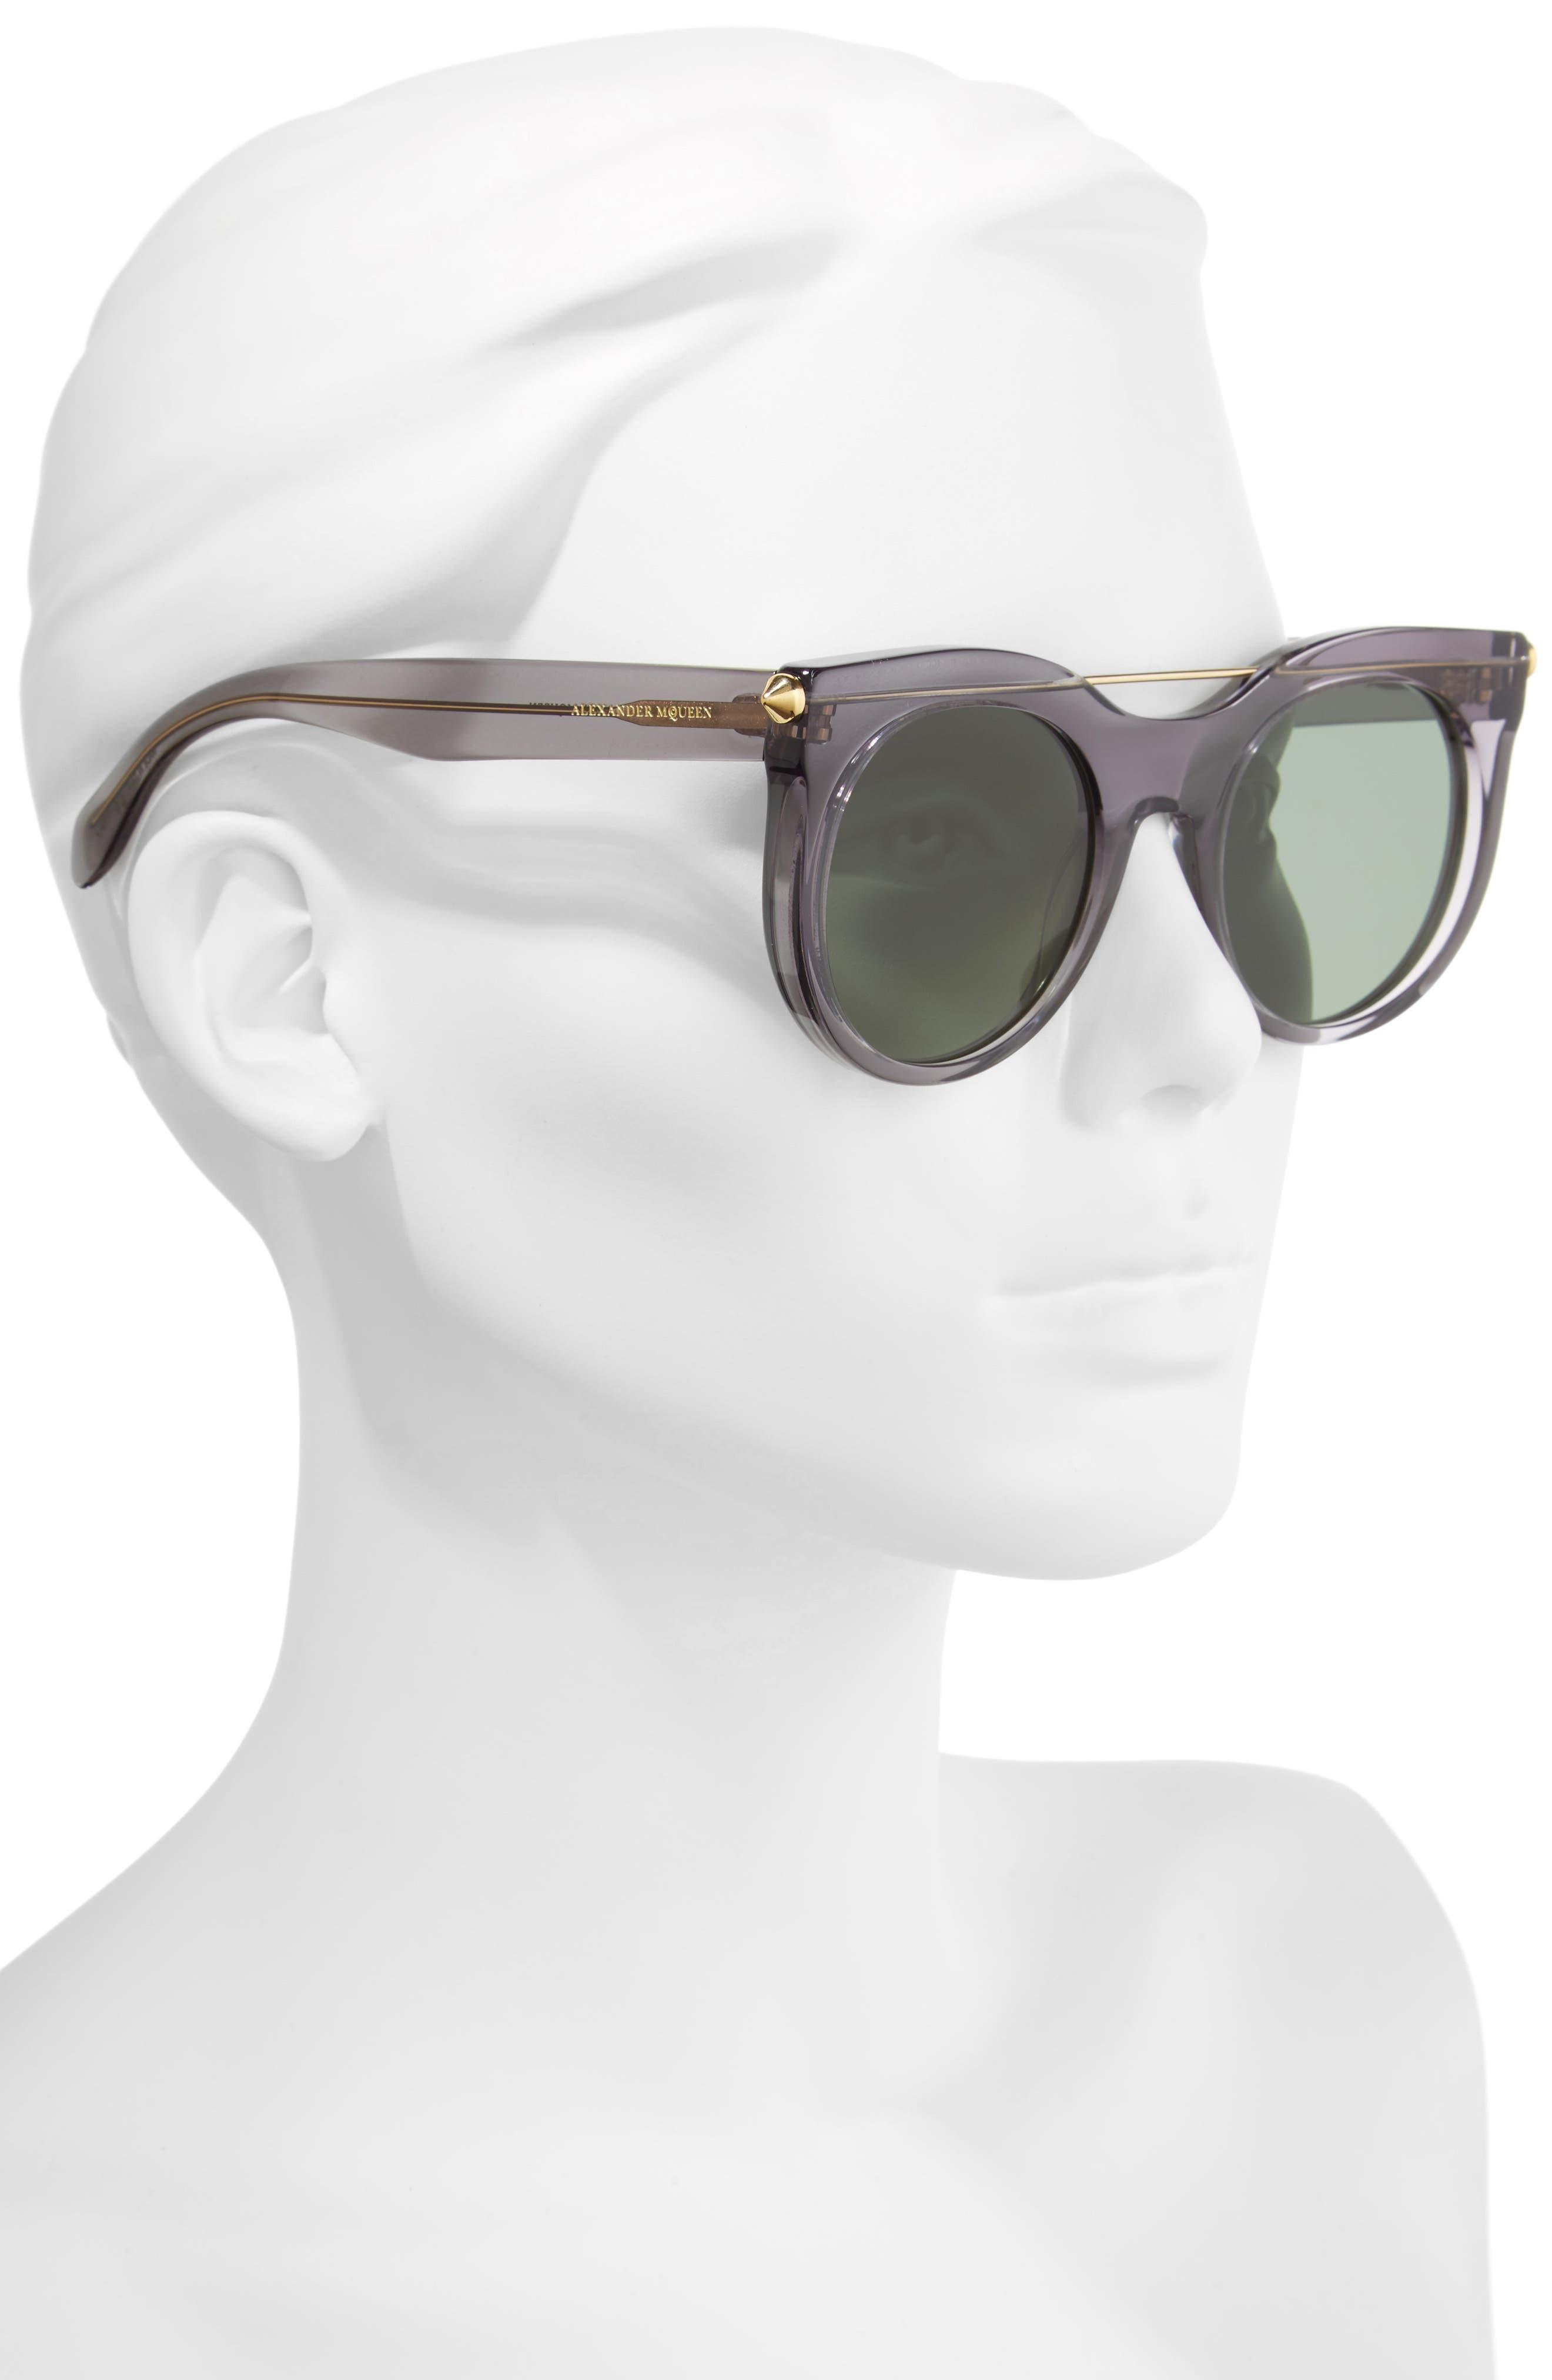 52mm Cat Eye Sunglasses,                             Alternate thumbnail 2, color,                             Grey